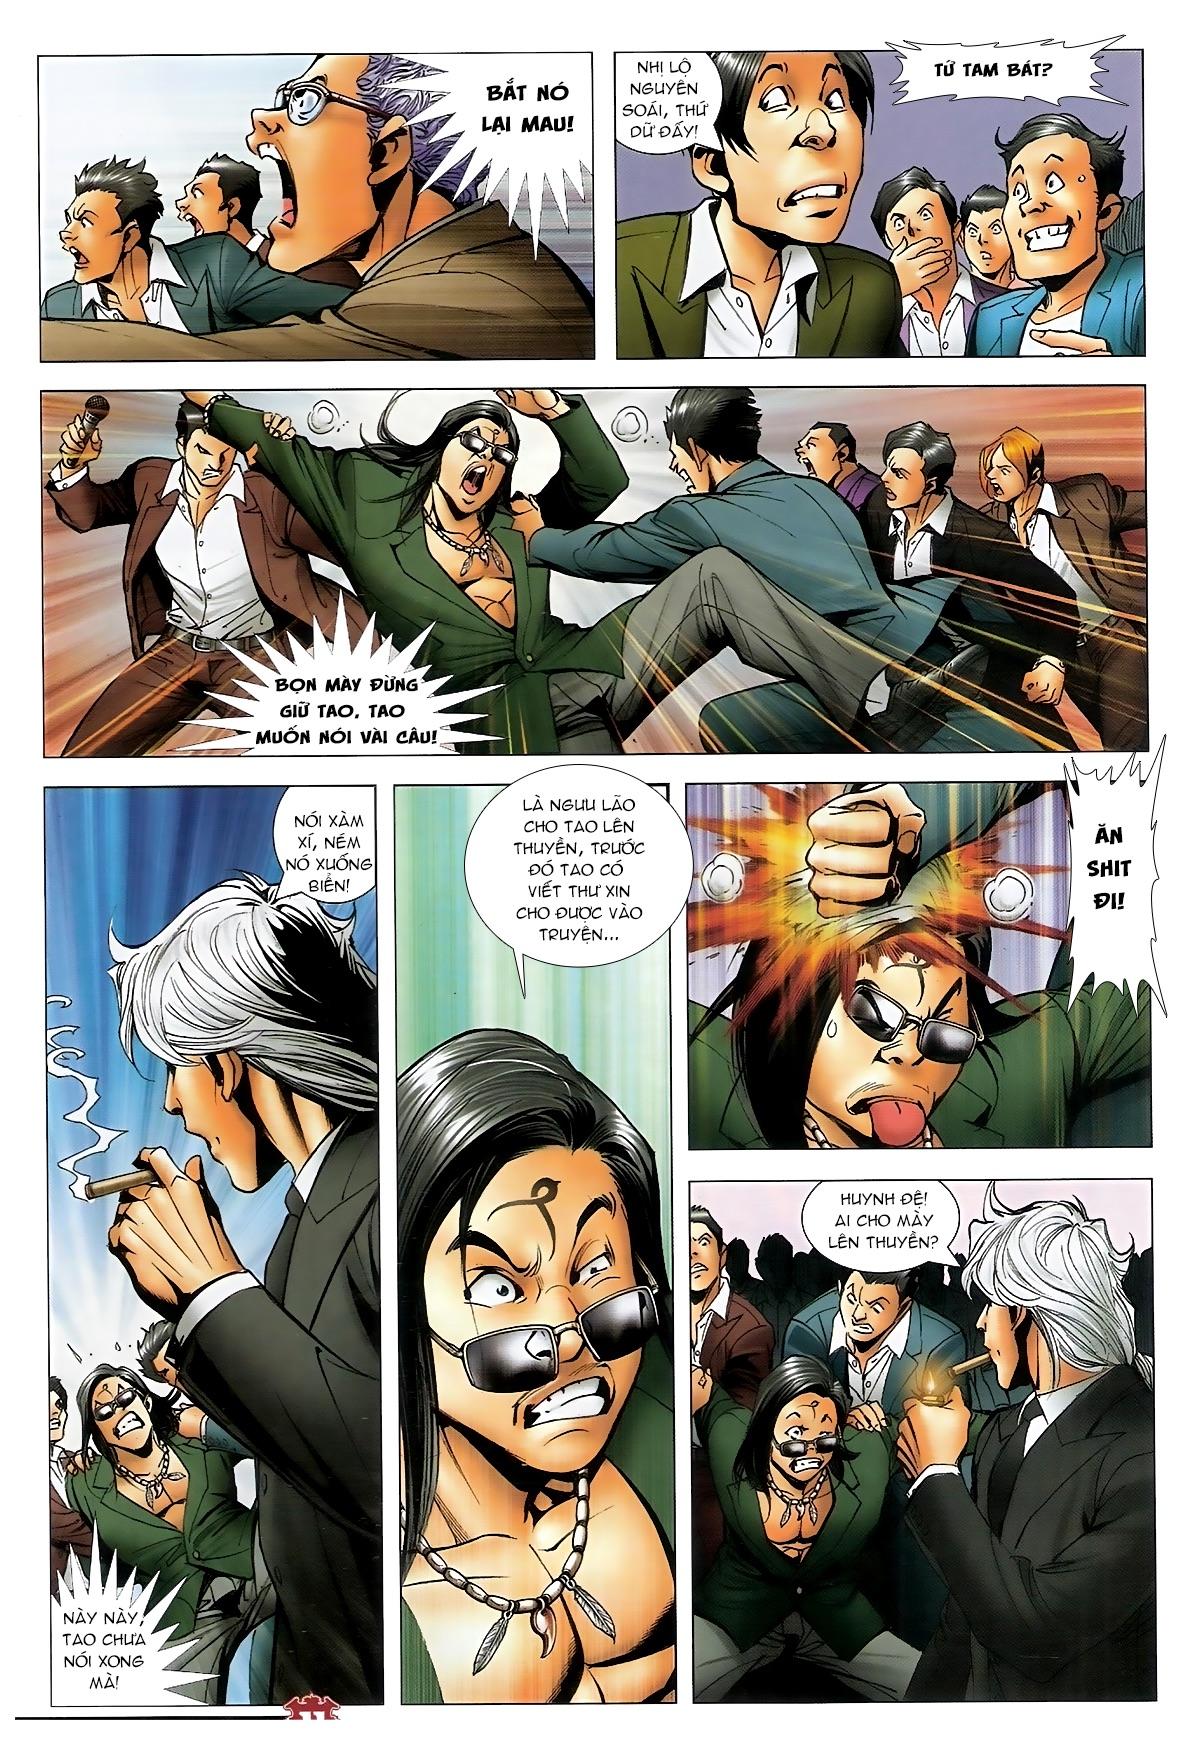 Người Trong Giang Hồ Chap 1495 - Truyen.Chap.VN